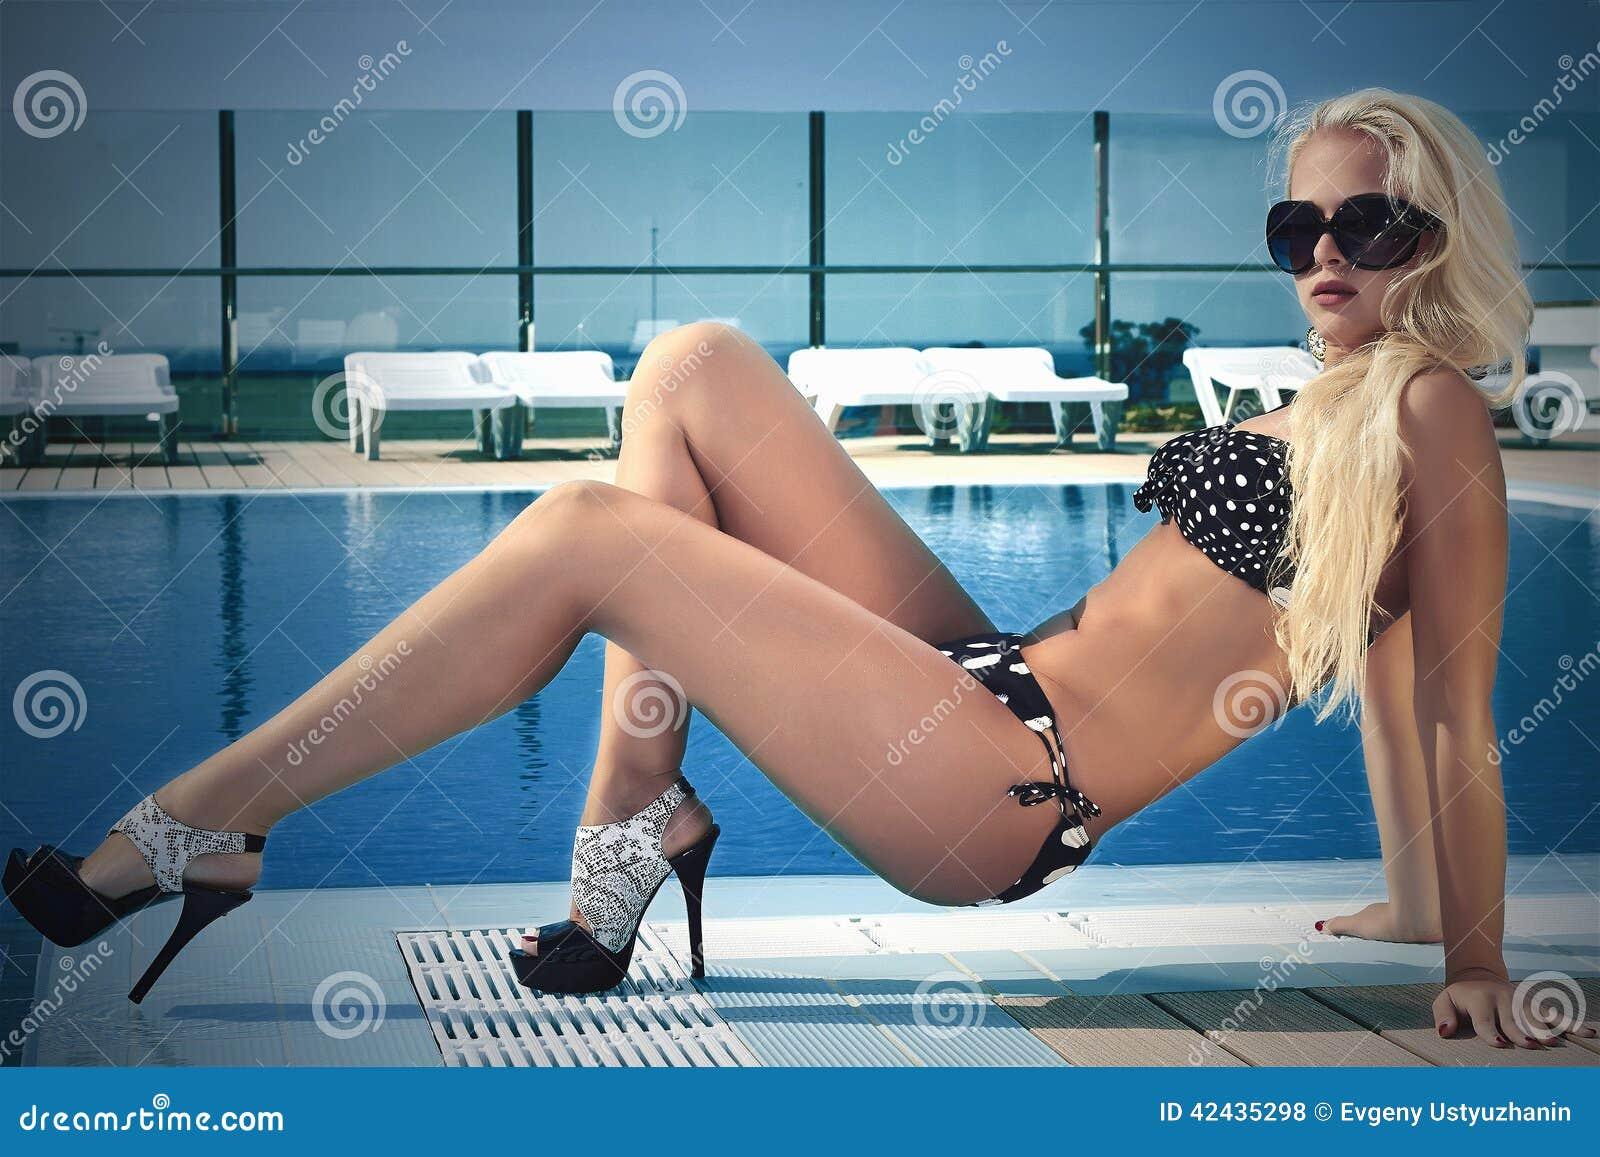 Altos Hermosa Atractiva En Rubia Gafas Mujer Tacones Ju31TlFKc